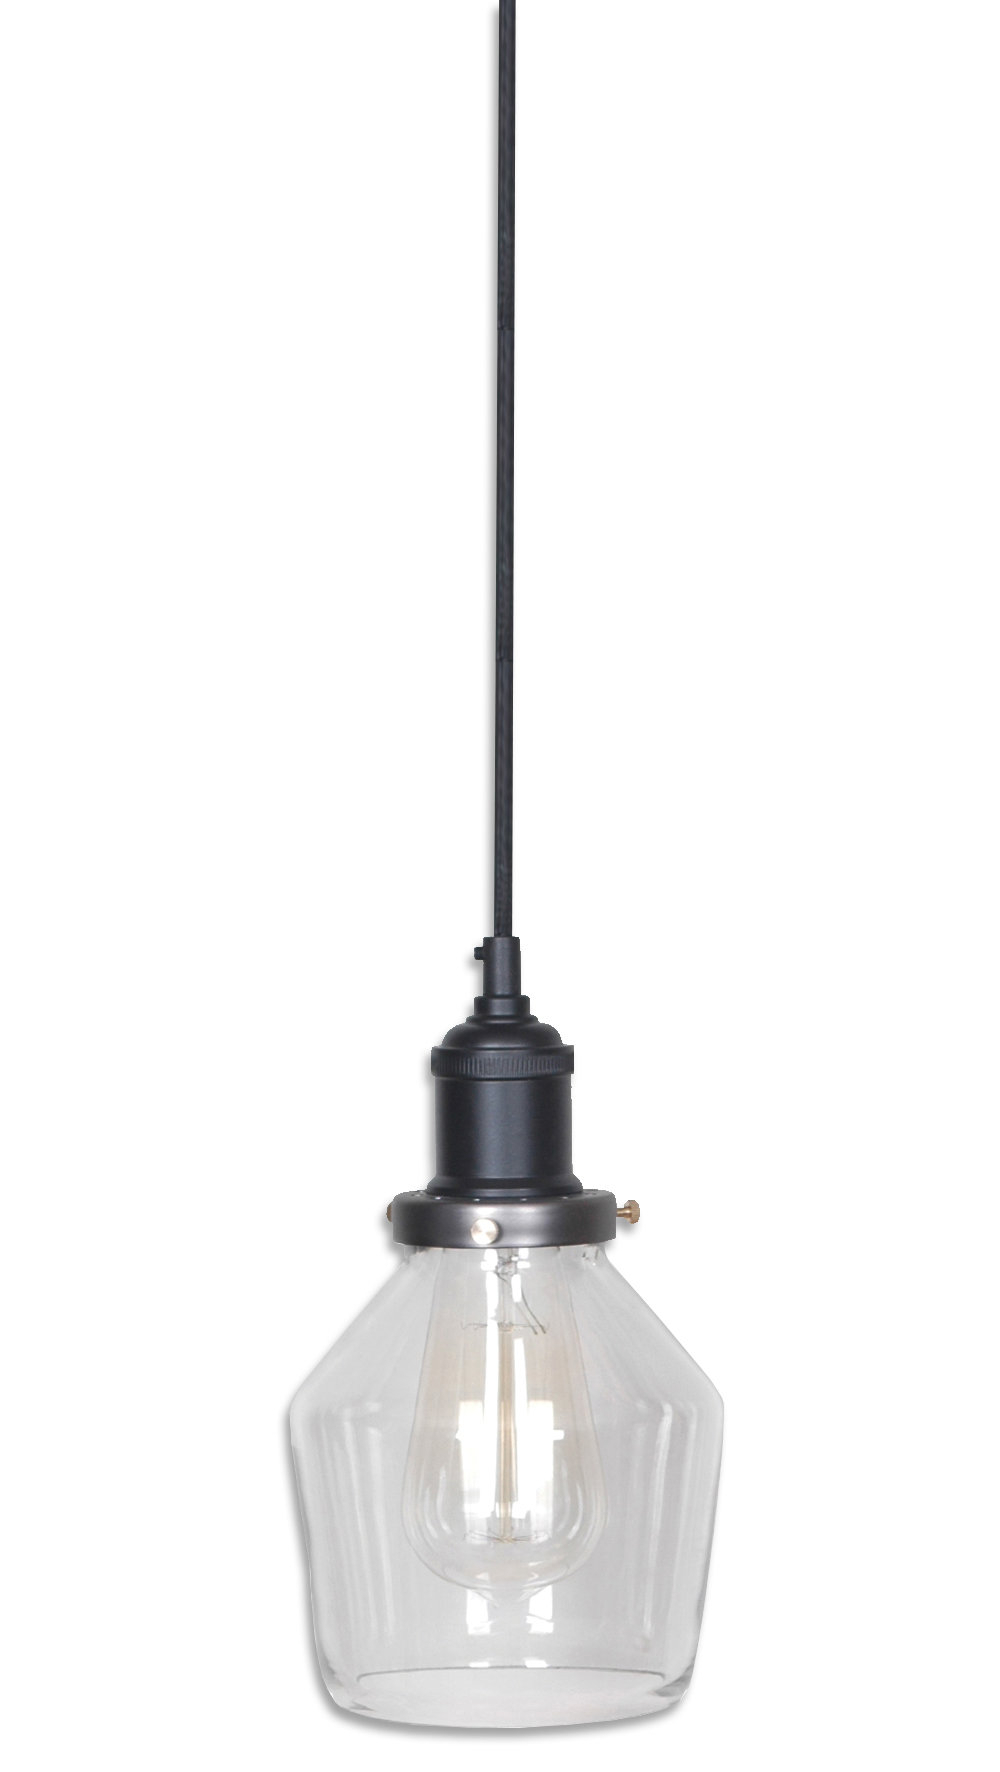 Most Recent Kitts 1 Light Single Bell Pendant Regarding Roslindale 1 Light Single Bell Pendants (View 11 of 25)